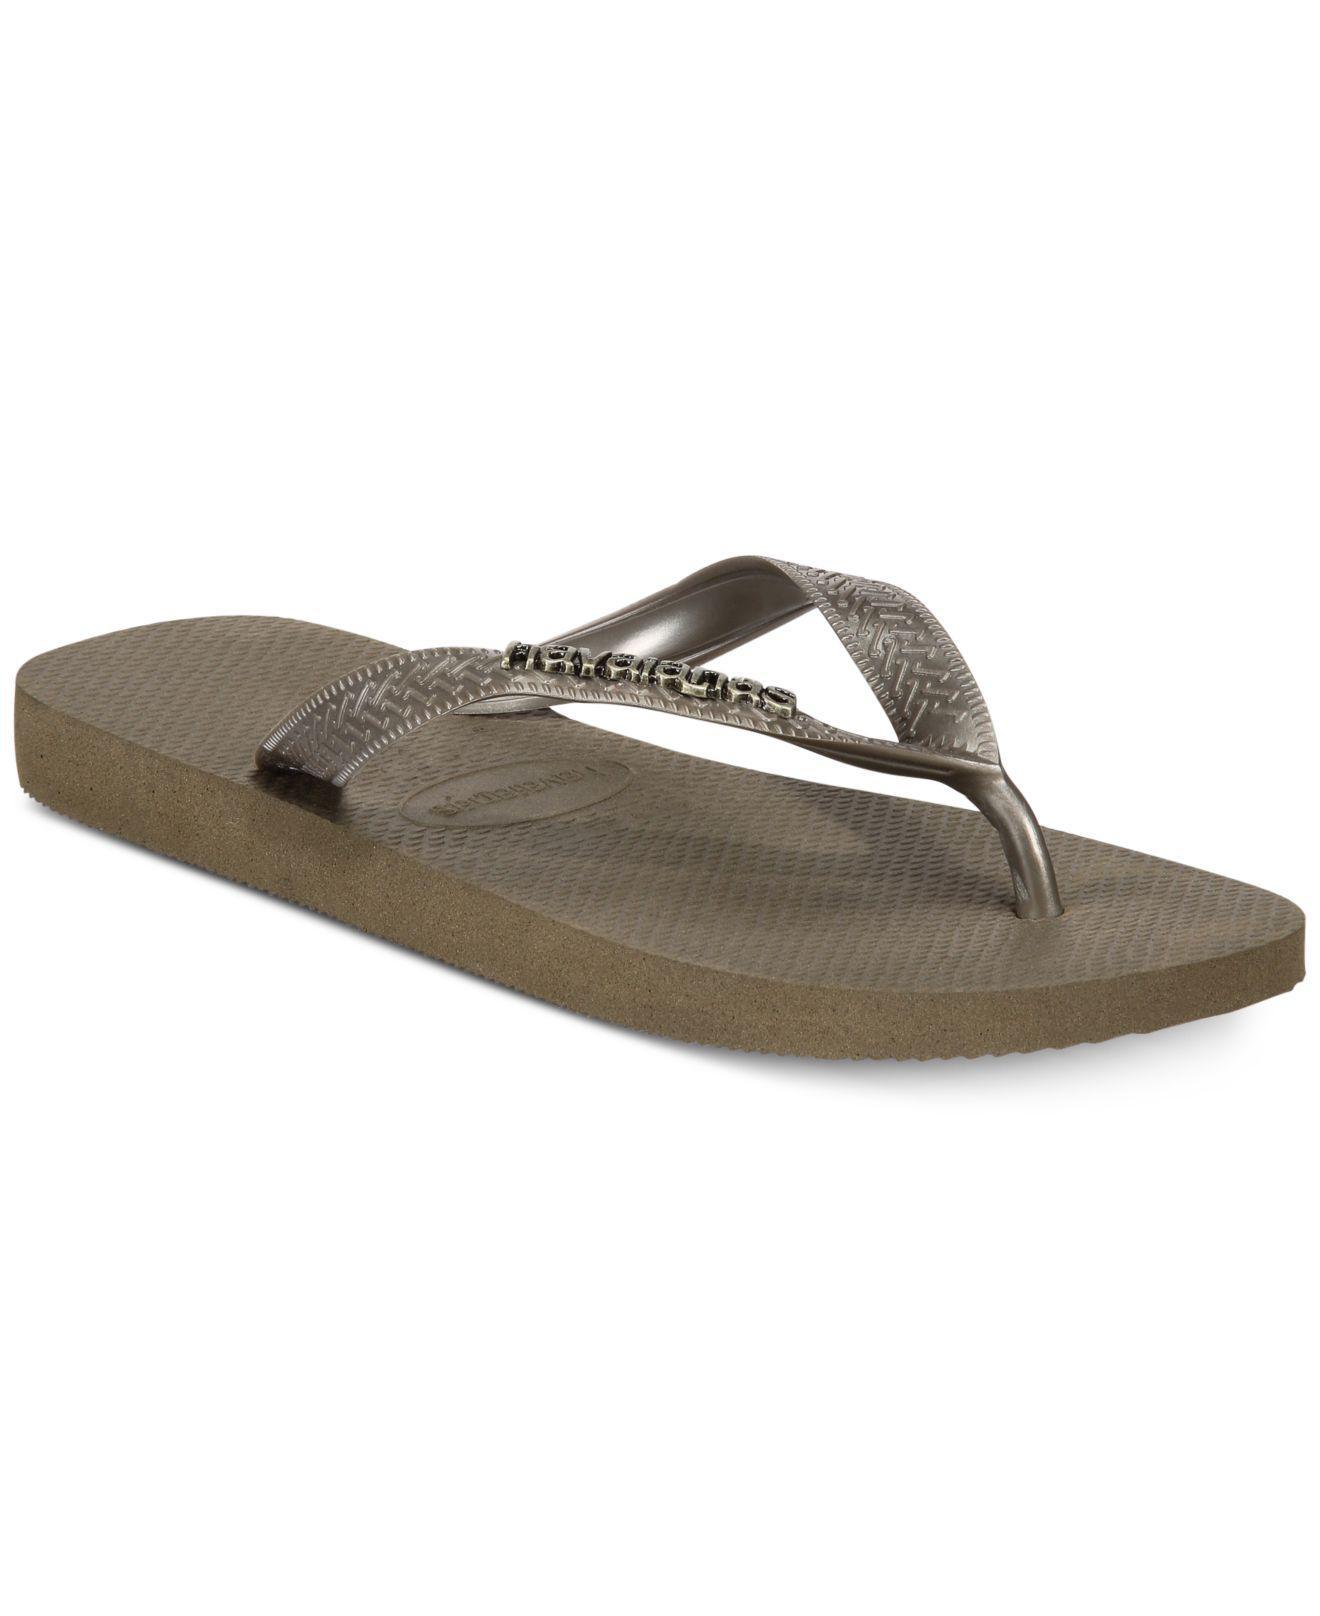 e0d07514e Lyst - Havaianas Top Logo Metallic Flip-flop Sandals in Green